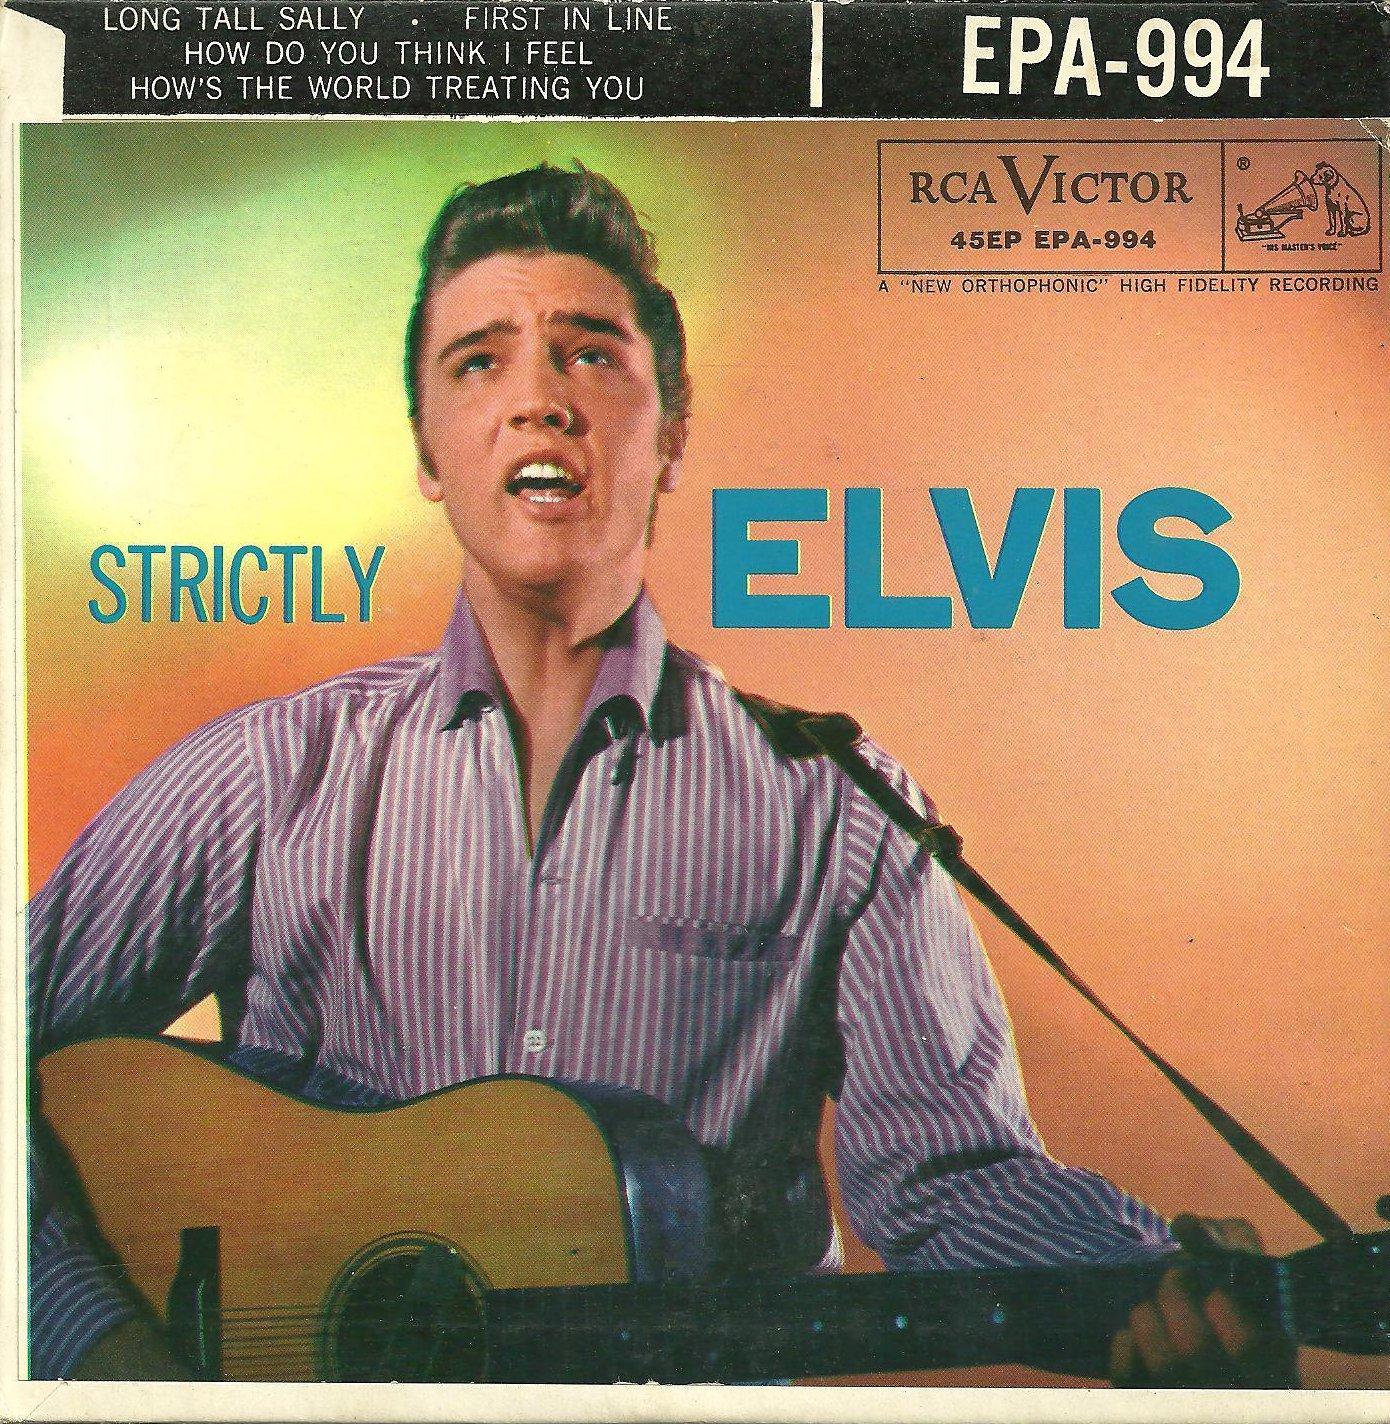 STRICTLY ELVIS Epa994aplz0r